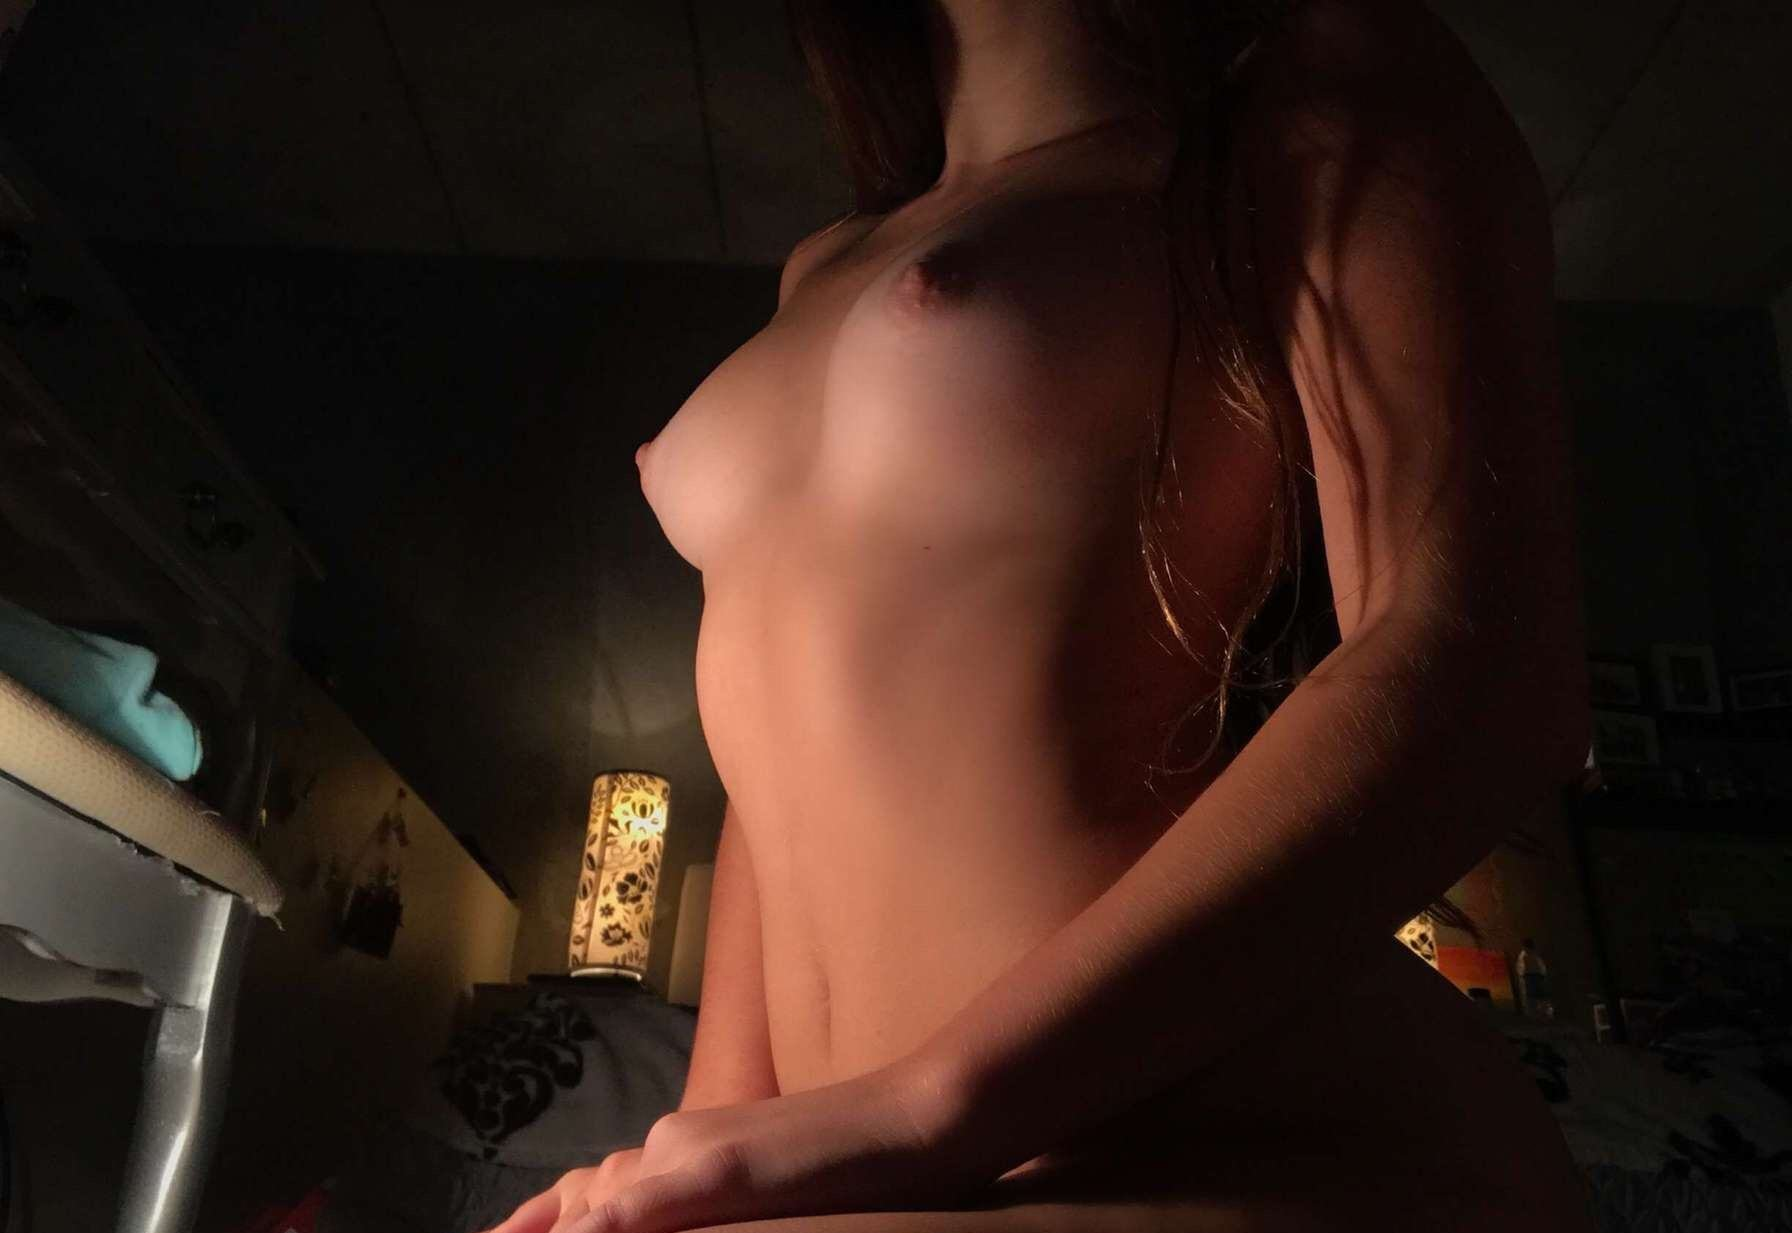 Kalysta Mallory Ksmoothie Onlyfans Nude Leaks 0021